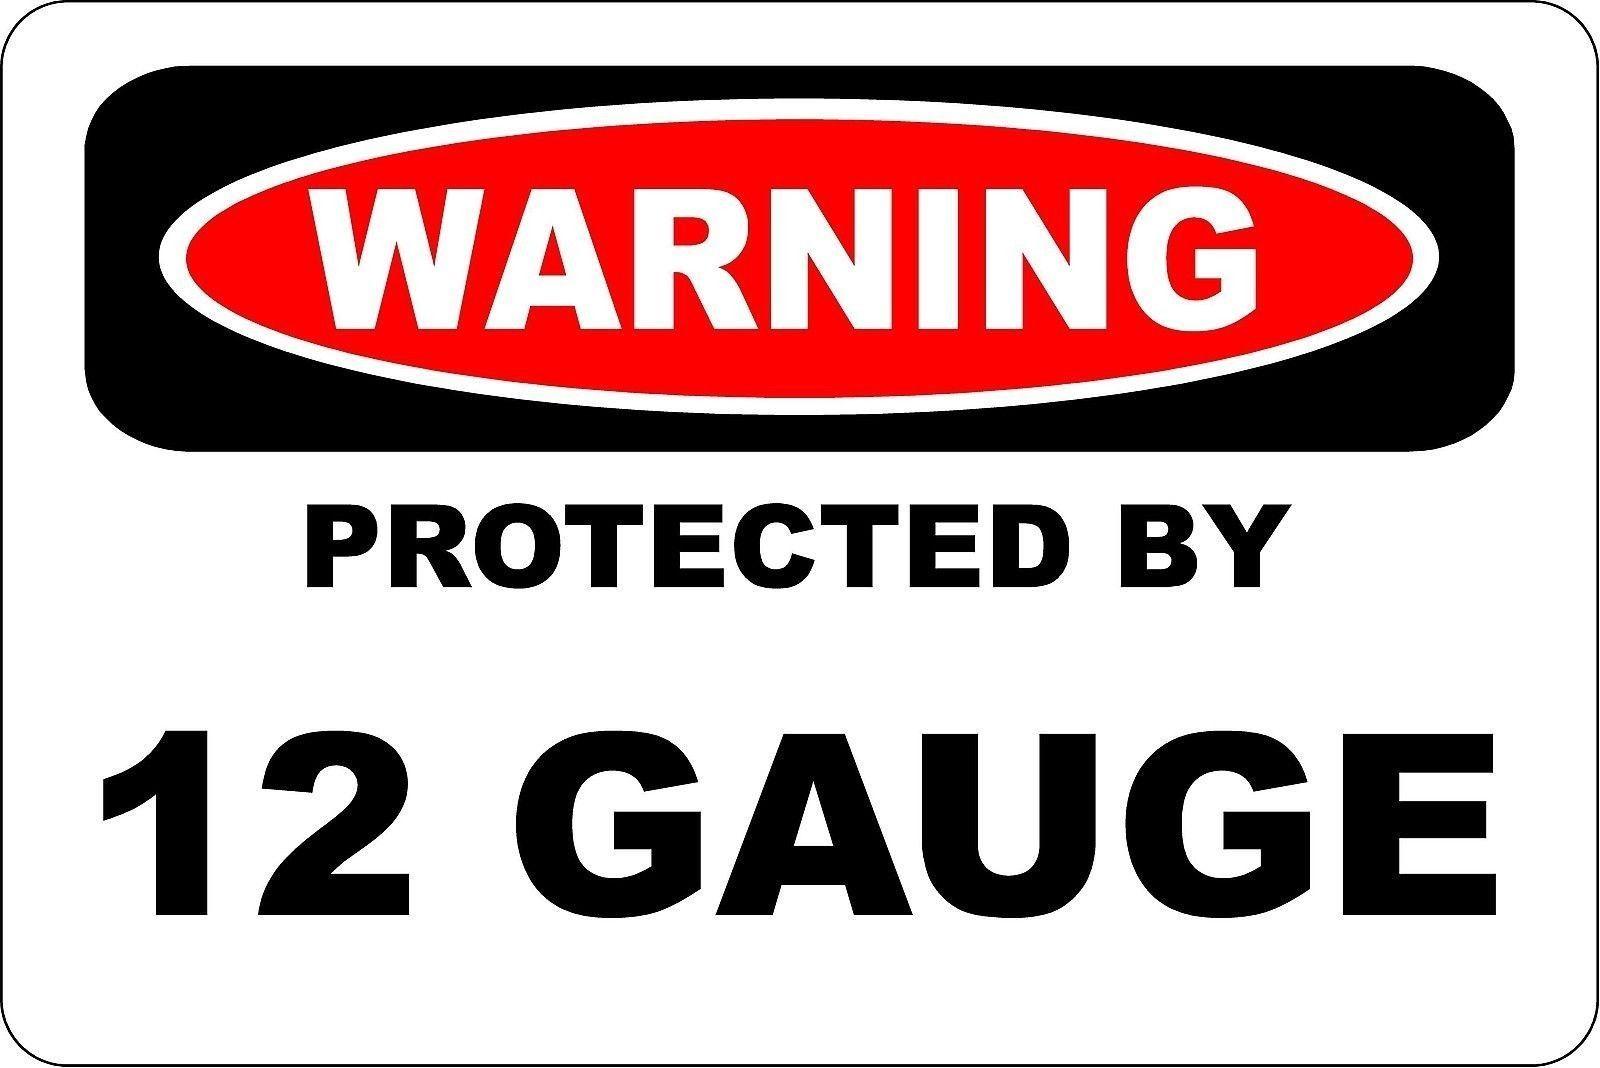 "Aluminum Warning Protected By 12 Gauge .Ga 8"" X 12"" Metal ..."